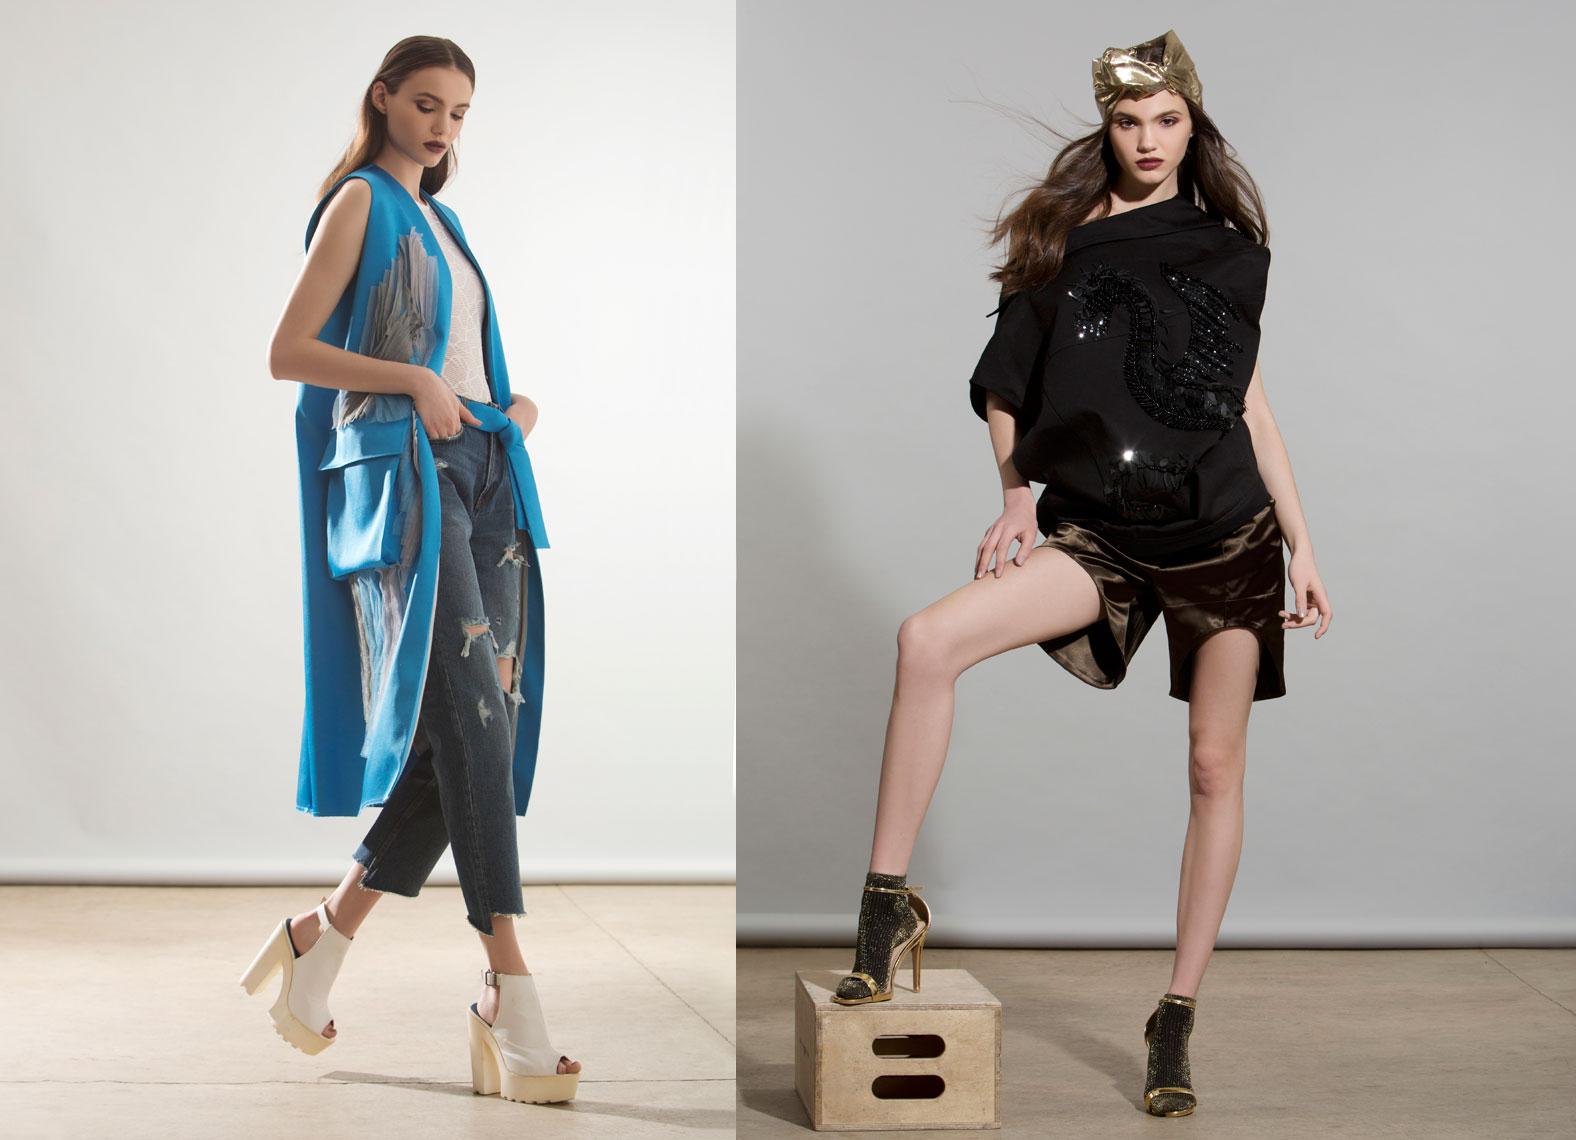 NYC-Fashion-and-Beauty-Photographer-Eric-Hason